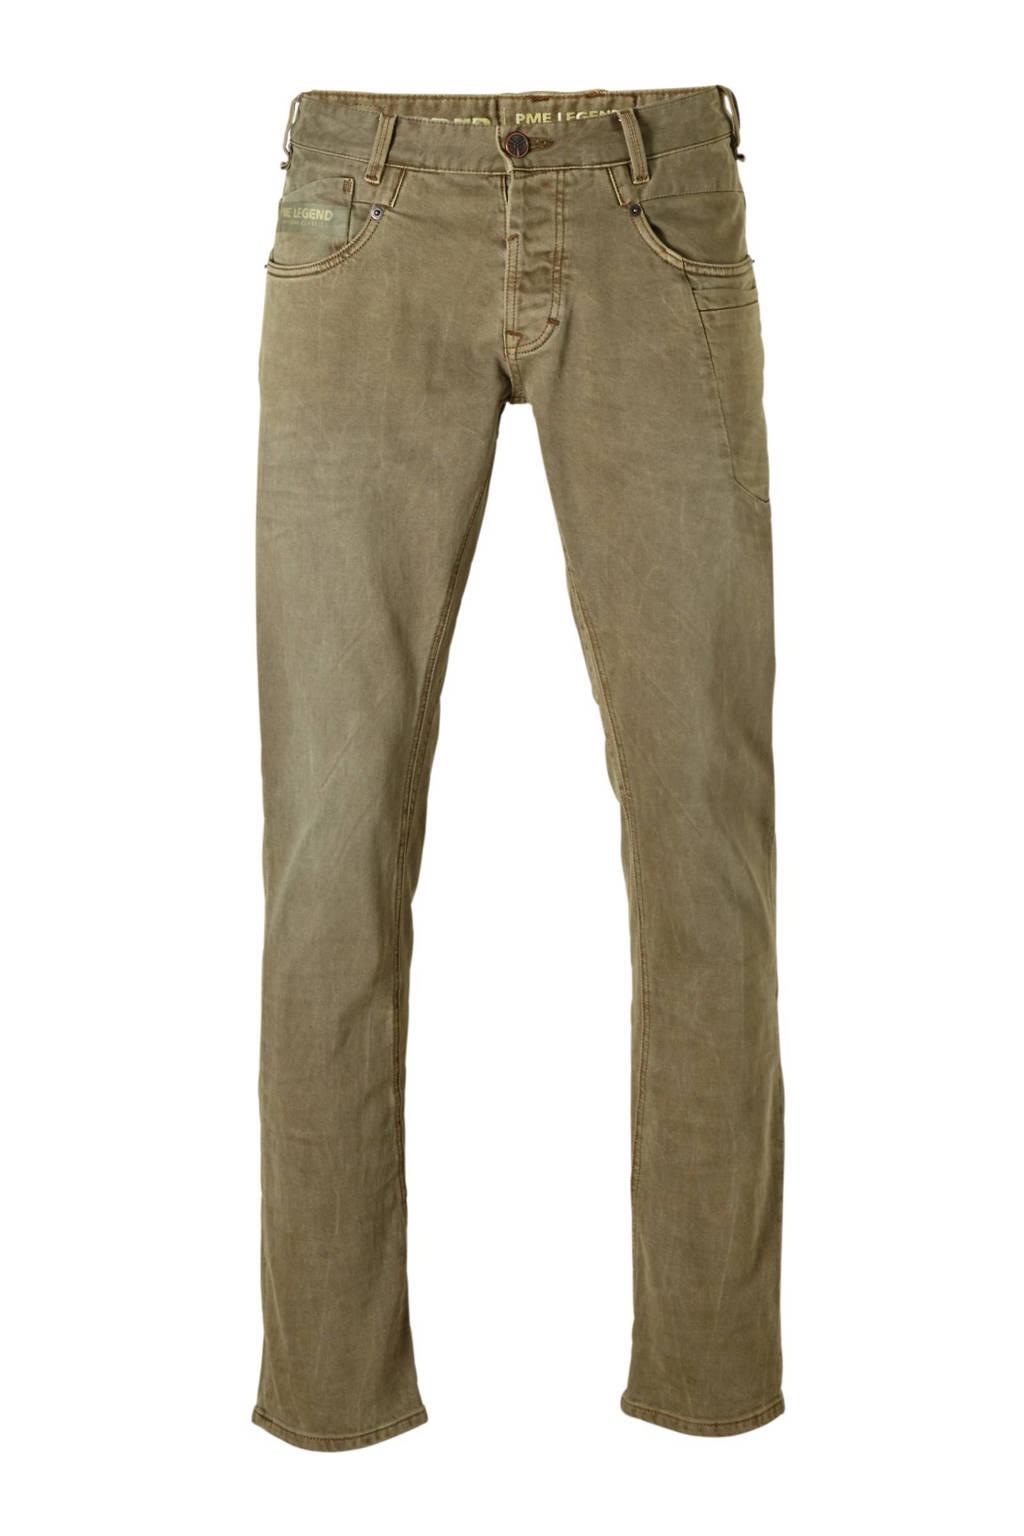 PME Legend Commander 2 regular fit jeans, 8020